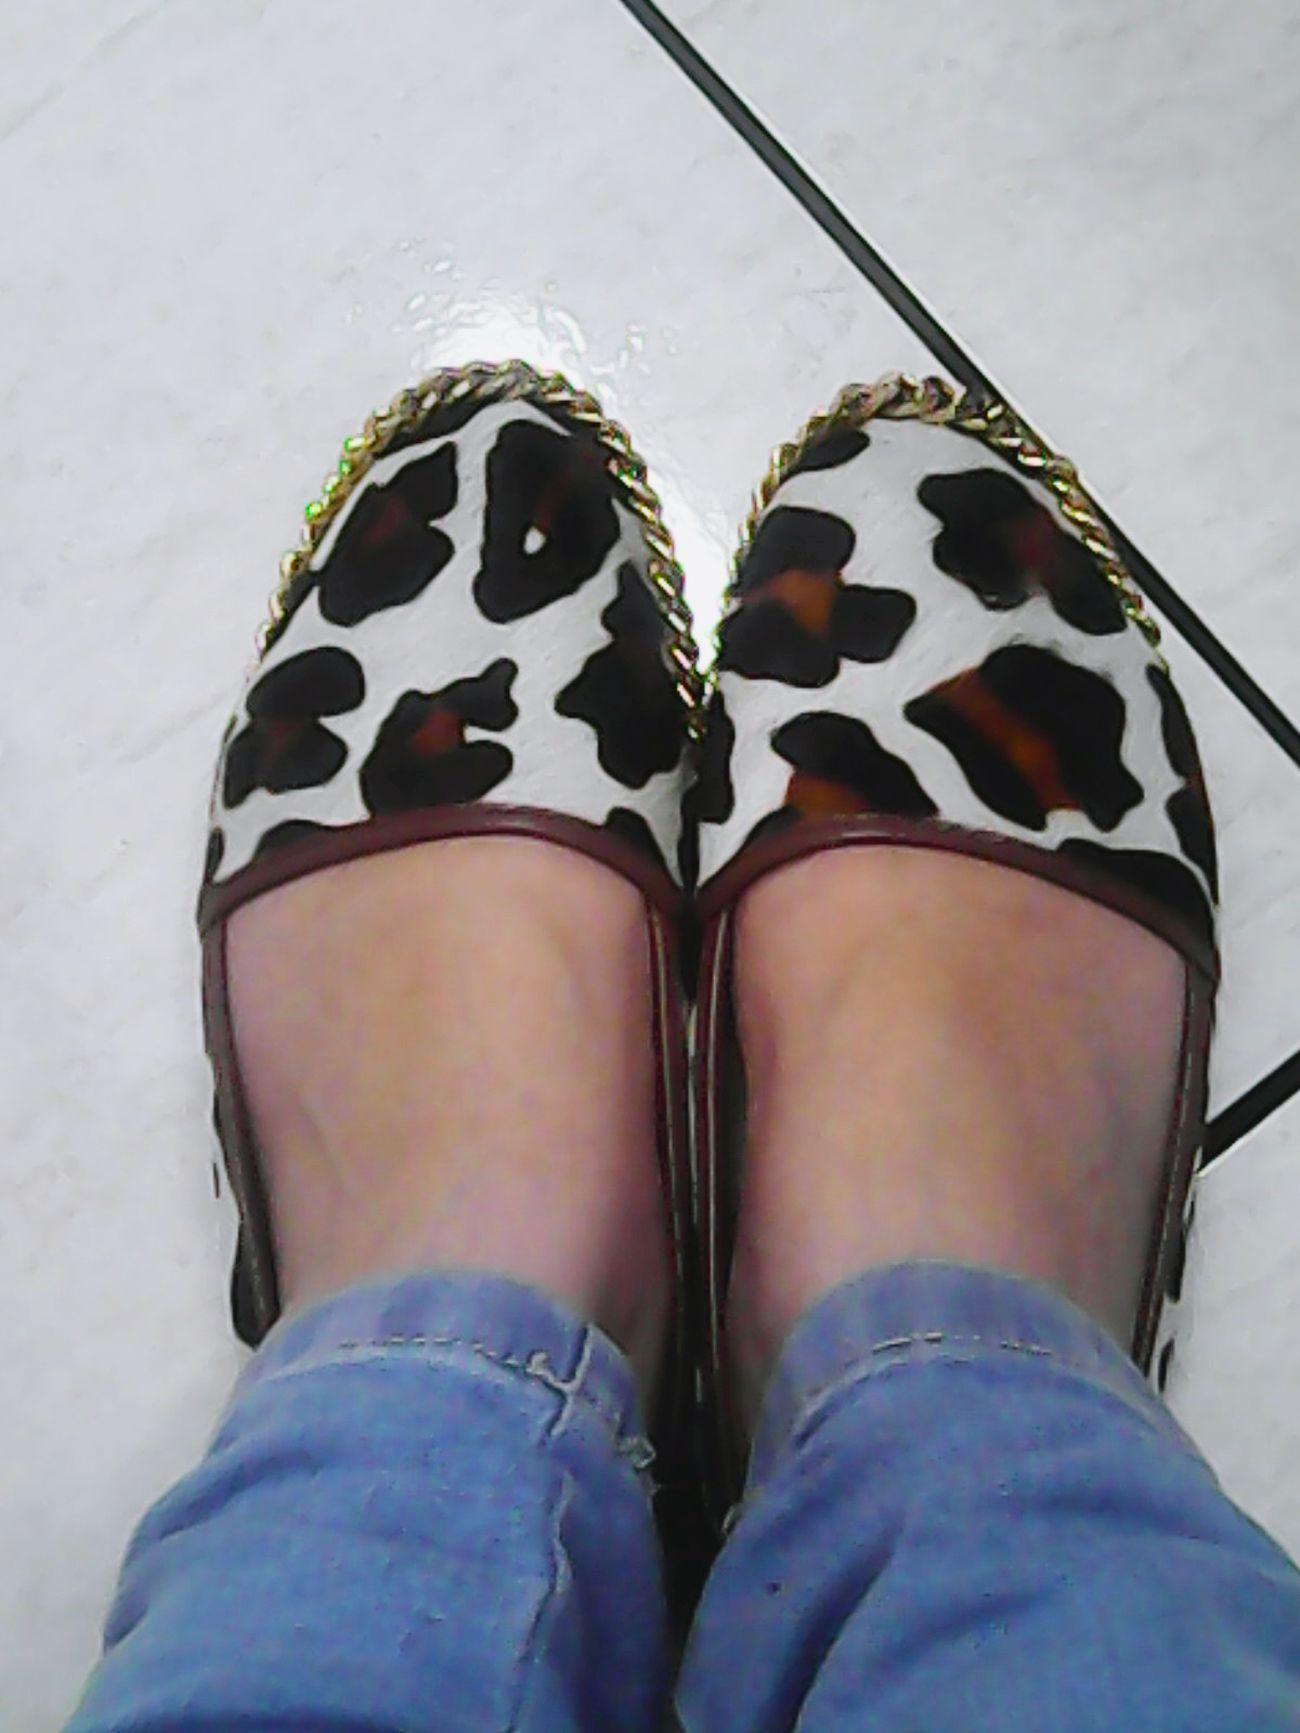 Slipon Shoeslover Miezko